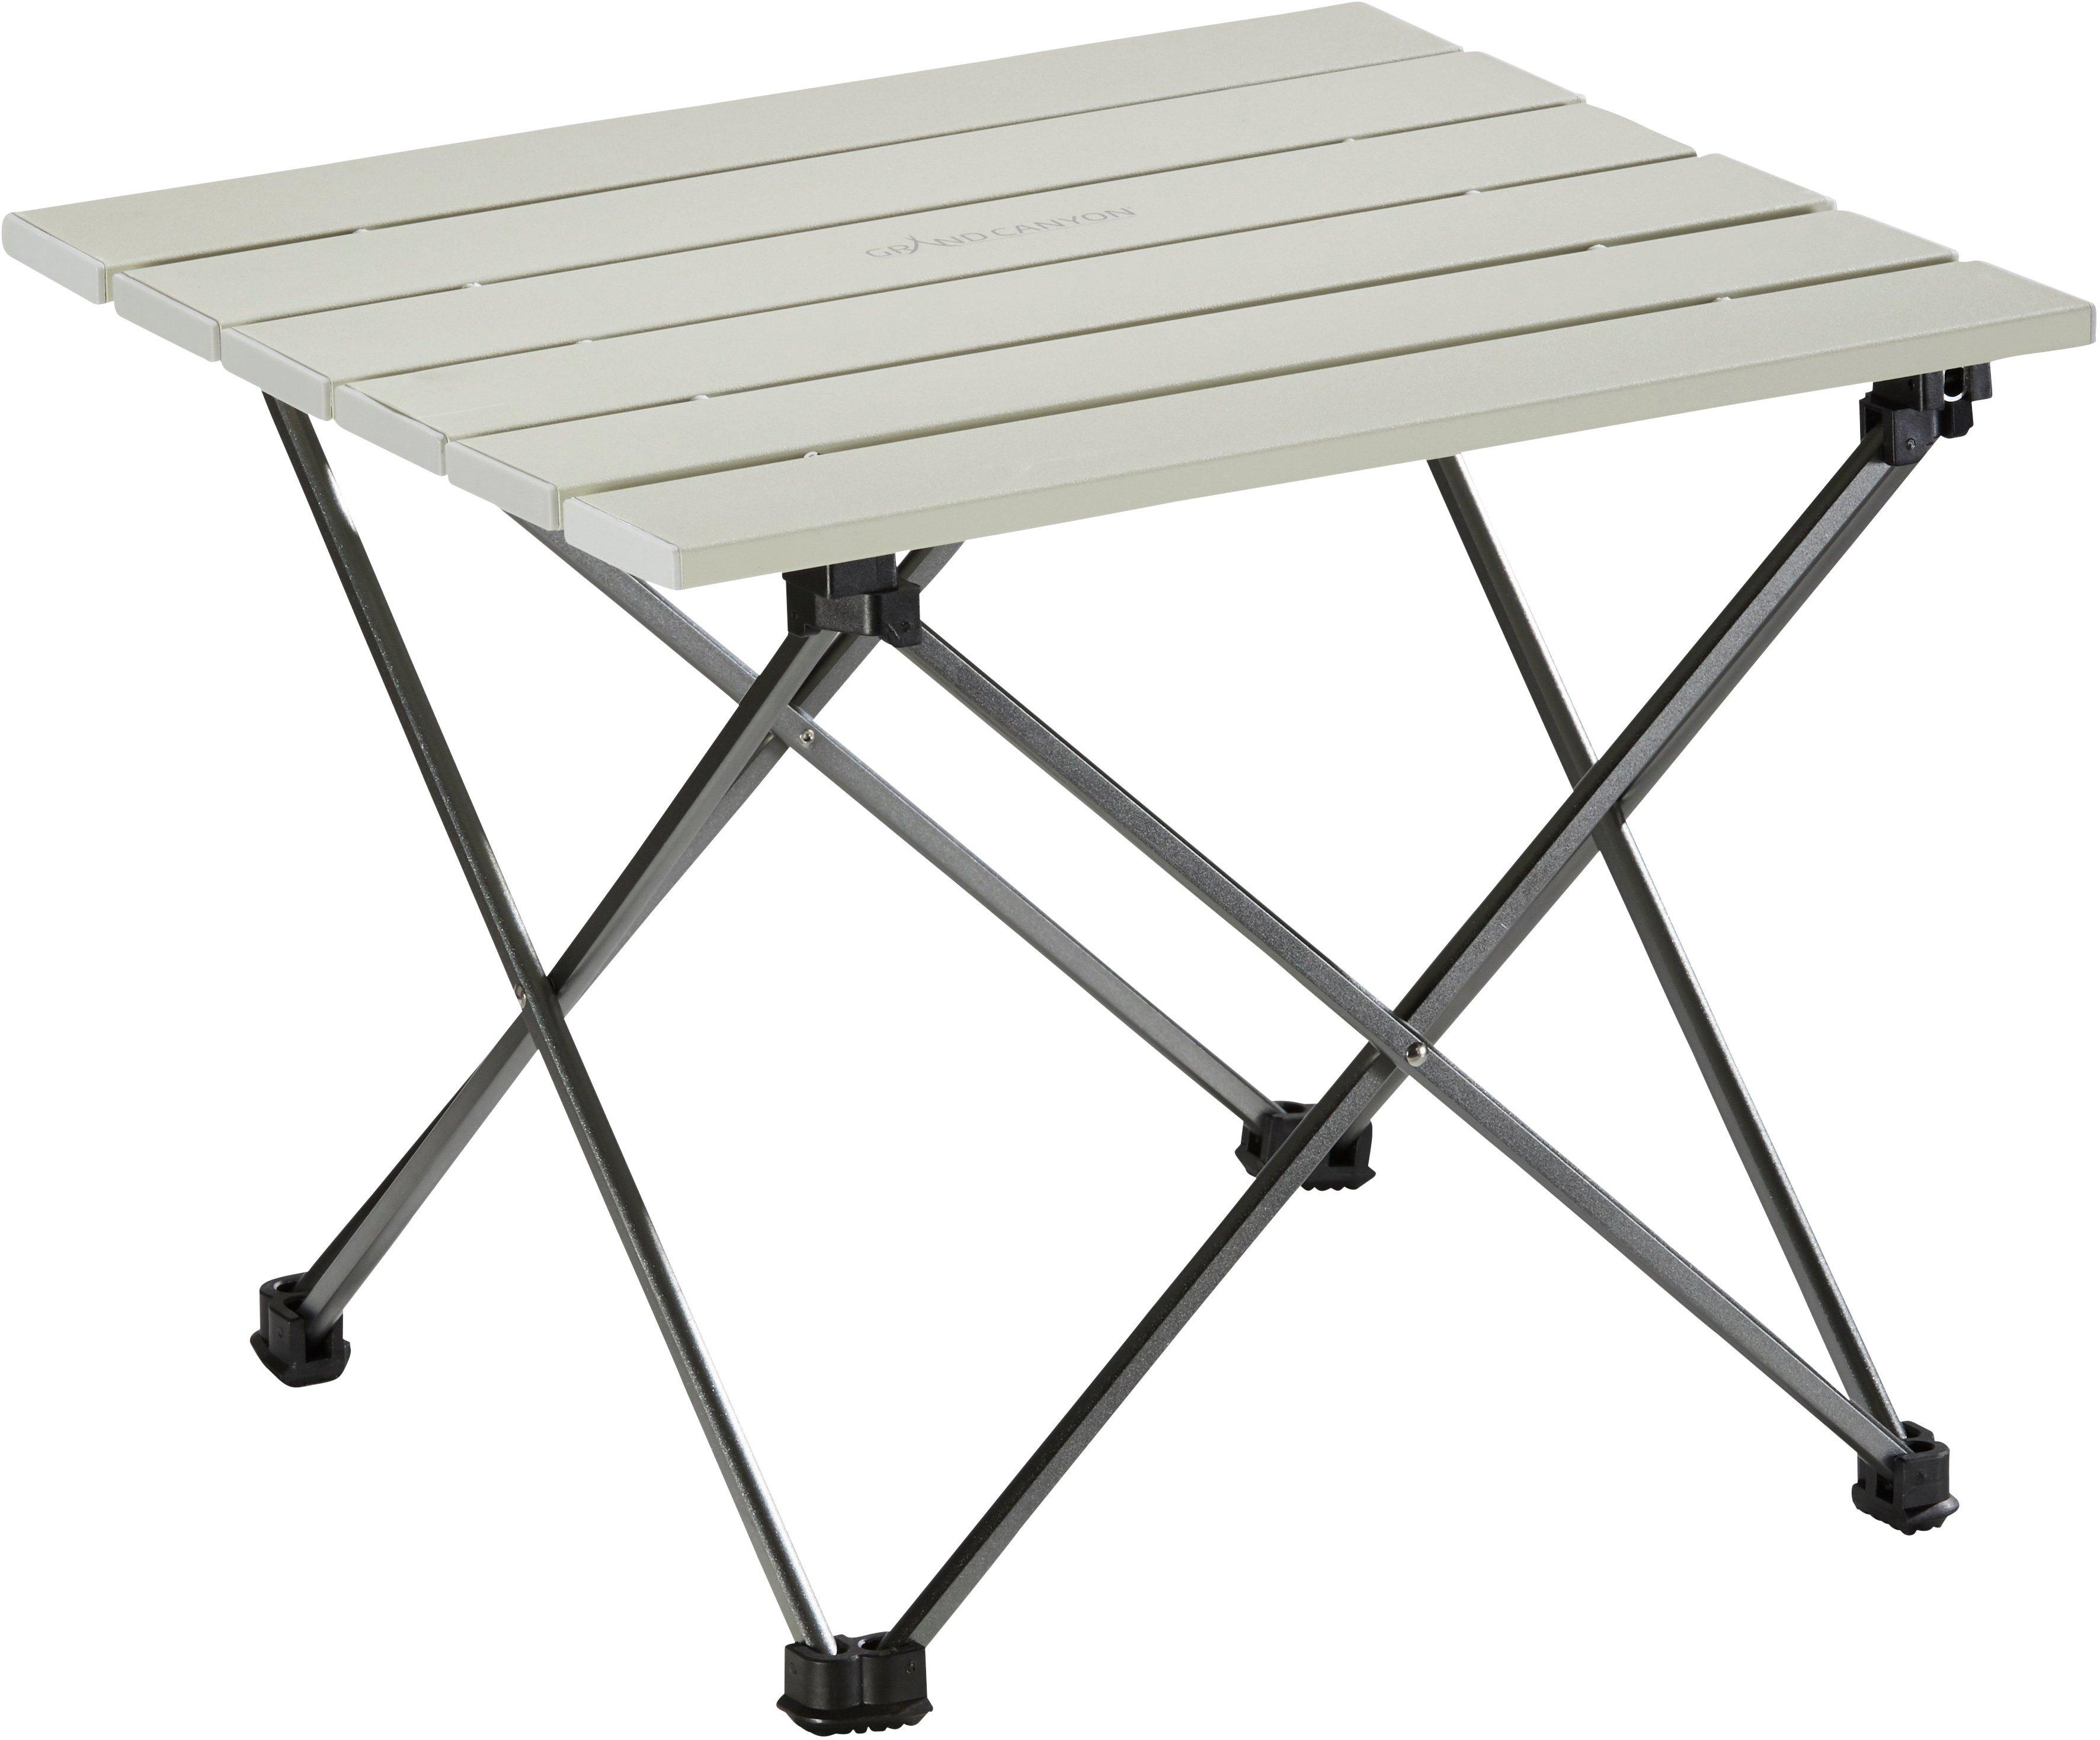 GRAND CANYON campingtafel TUCKET TABLE MINI online kopen op otto.nl